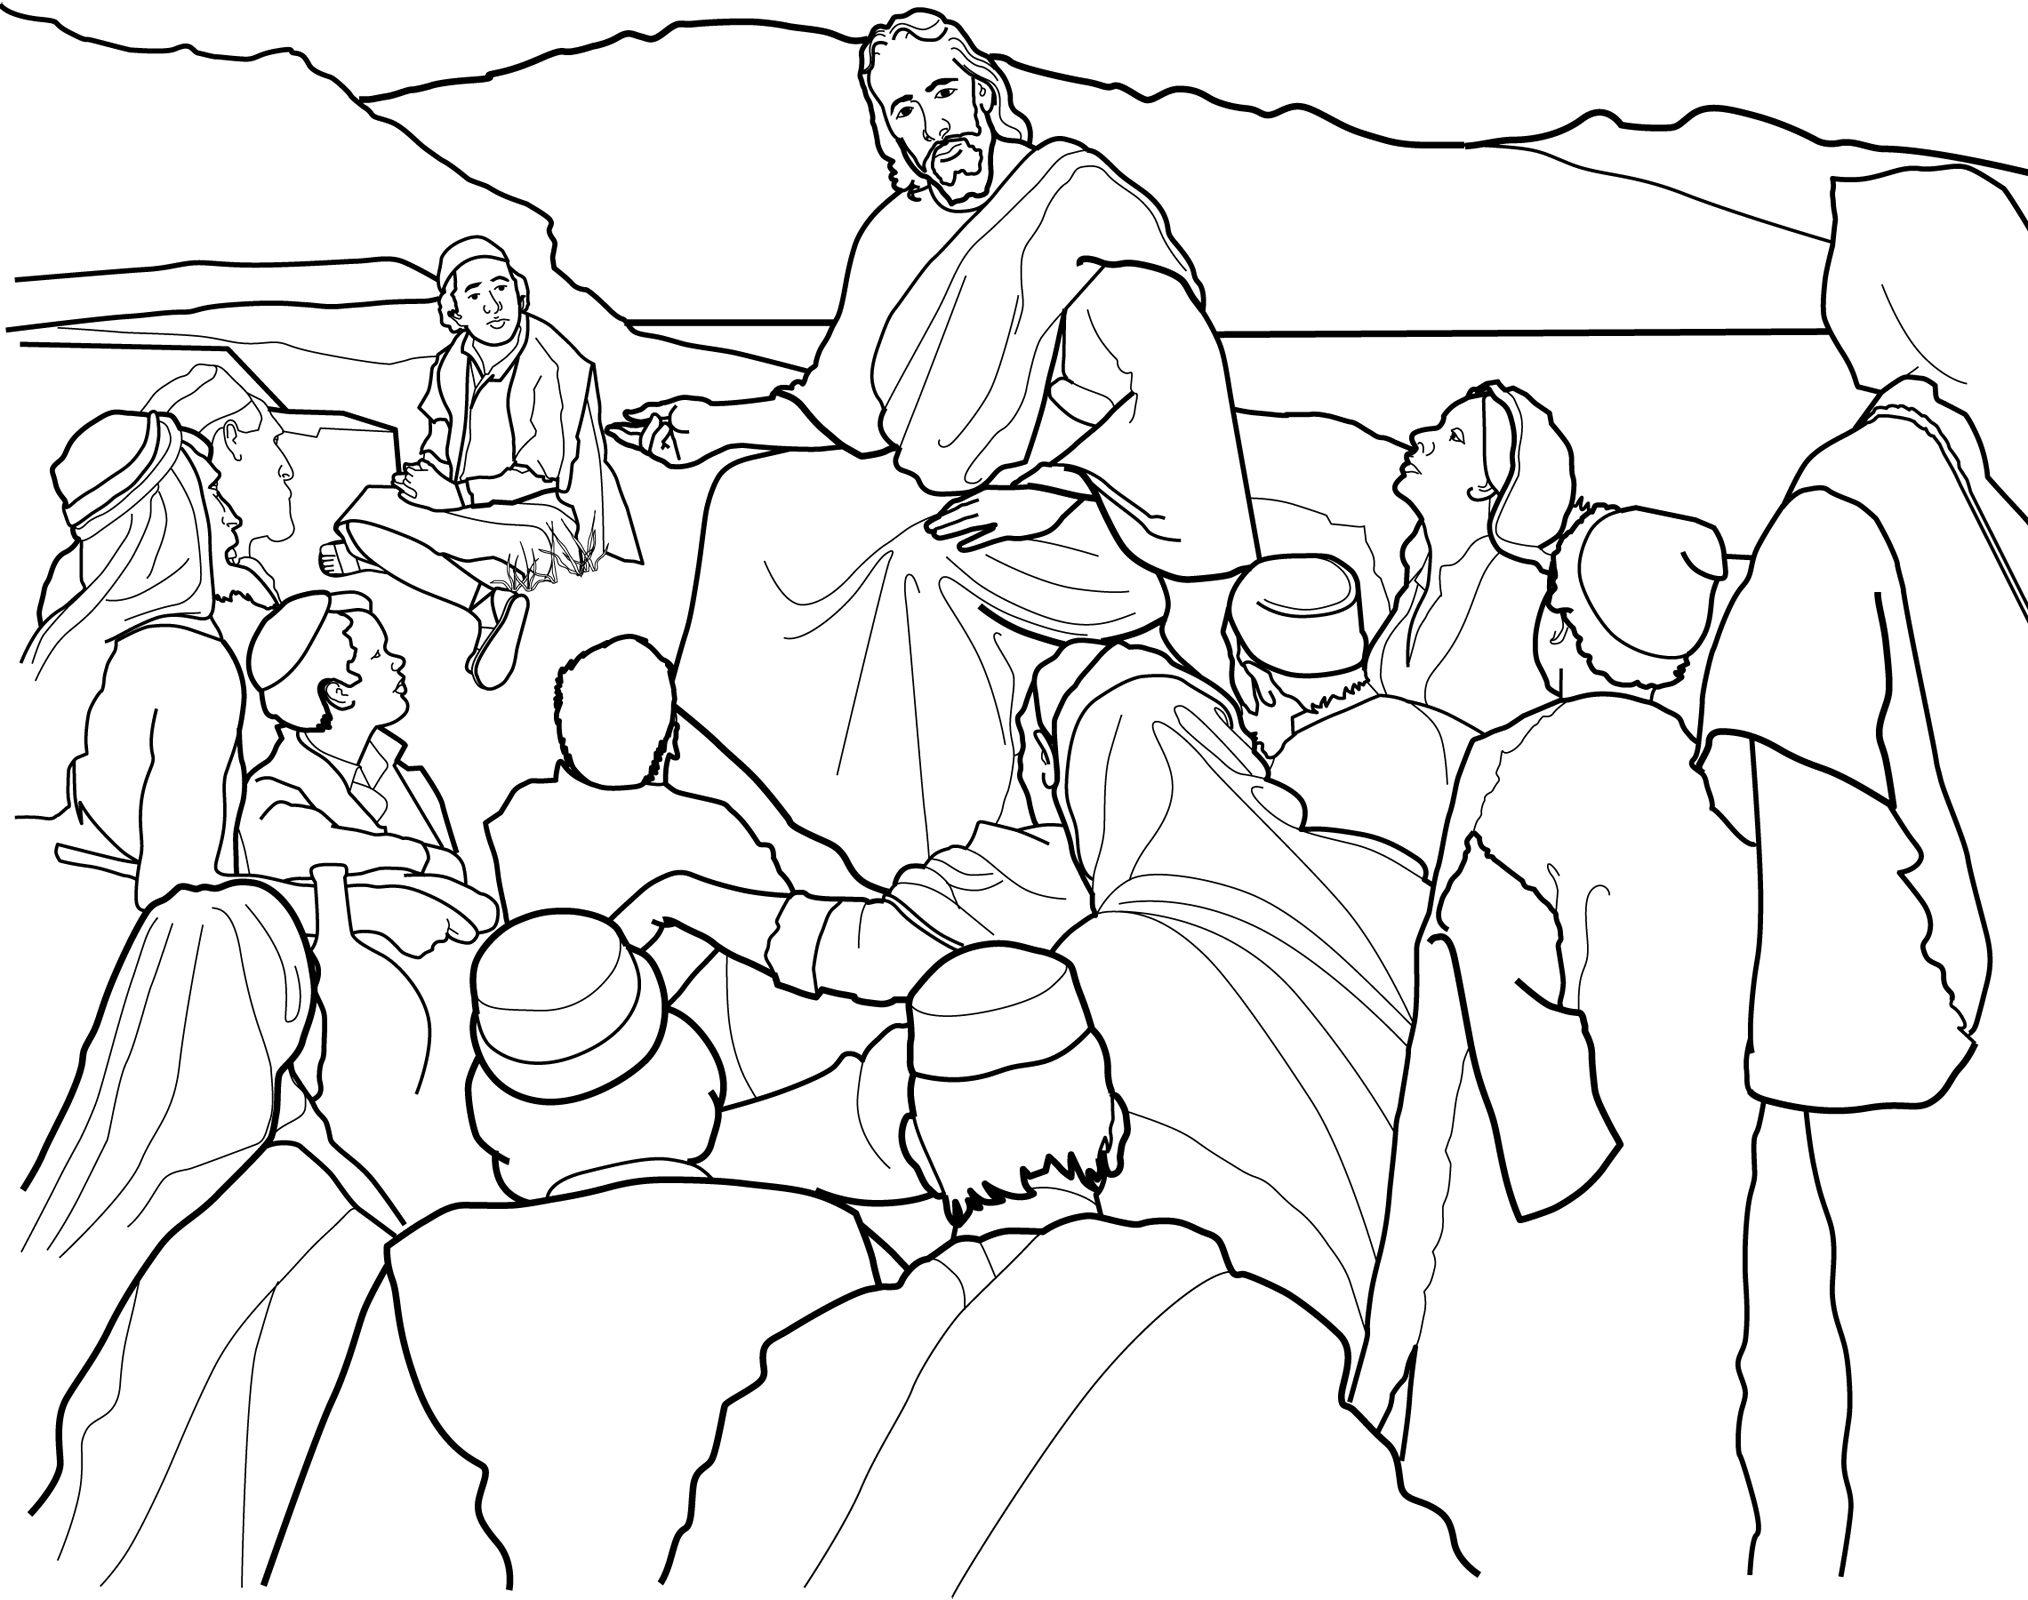 The Sermon on the Mount\